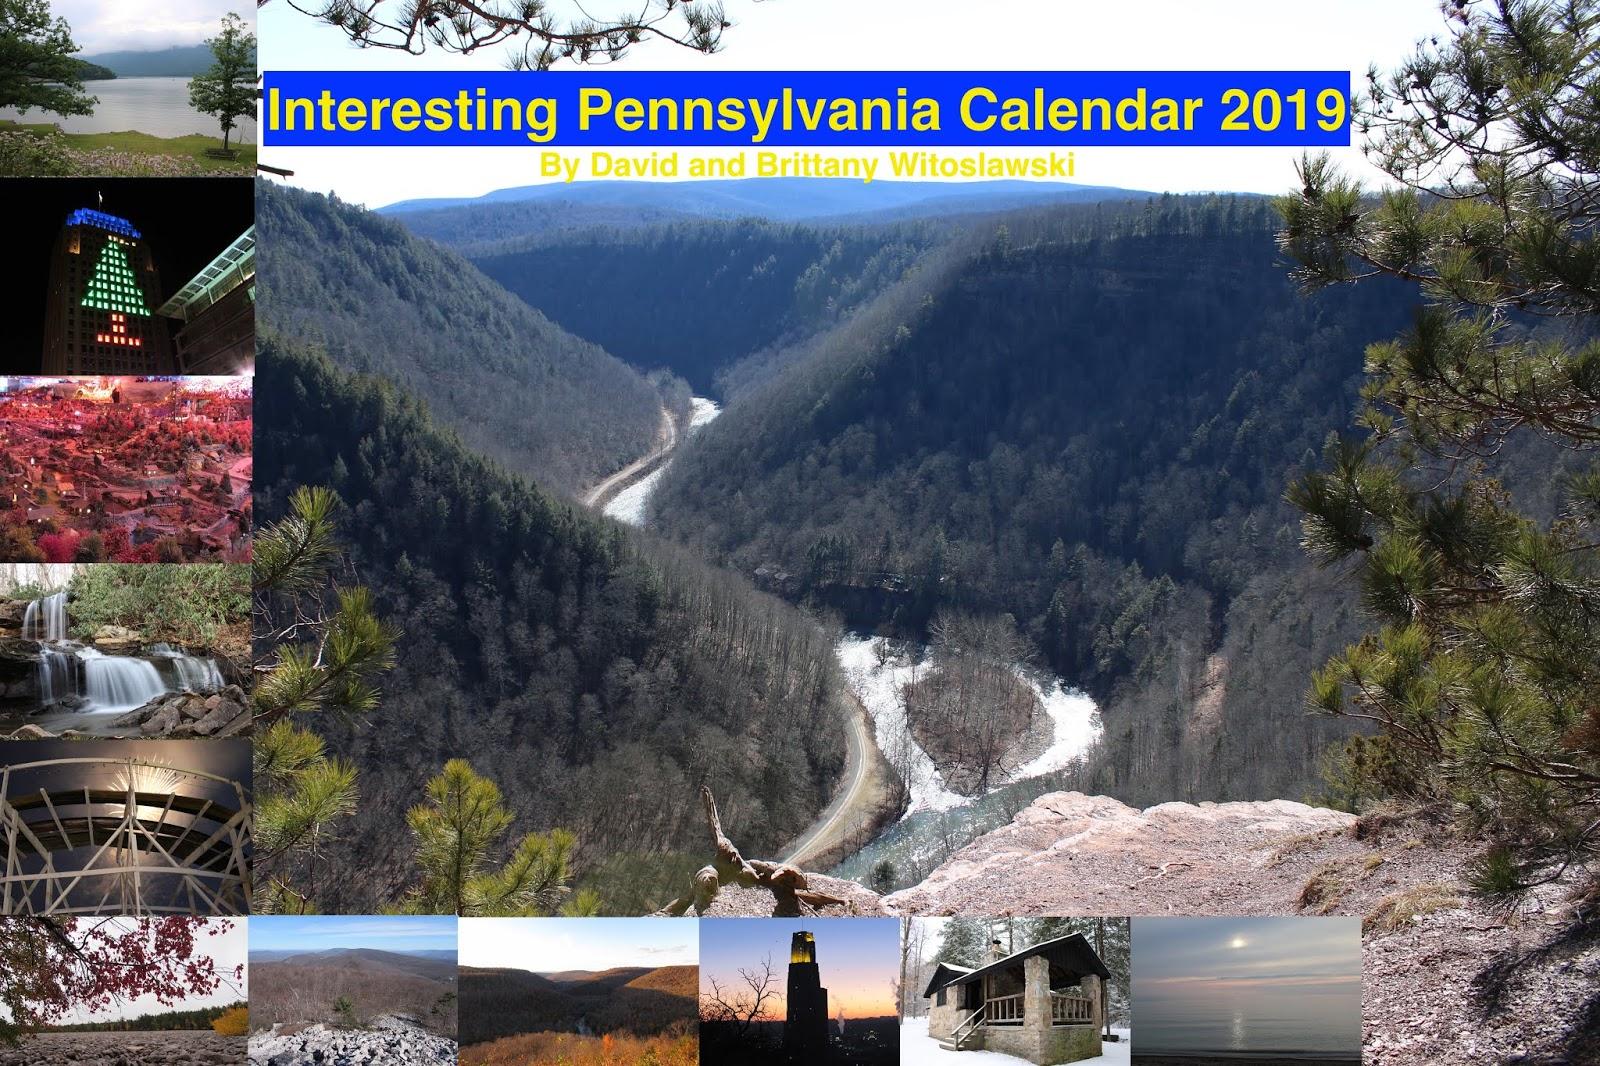 Calendrier Trail Bretagne 2019.Interesting Pennsylvania And Beyond 2019 Interesting